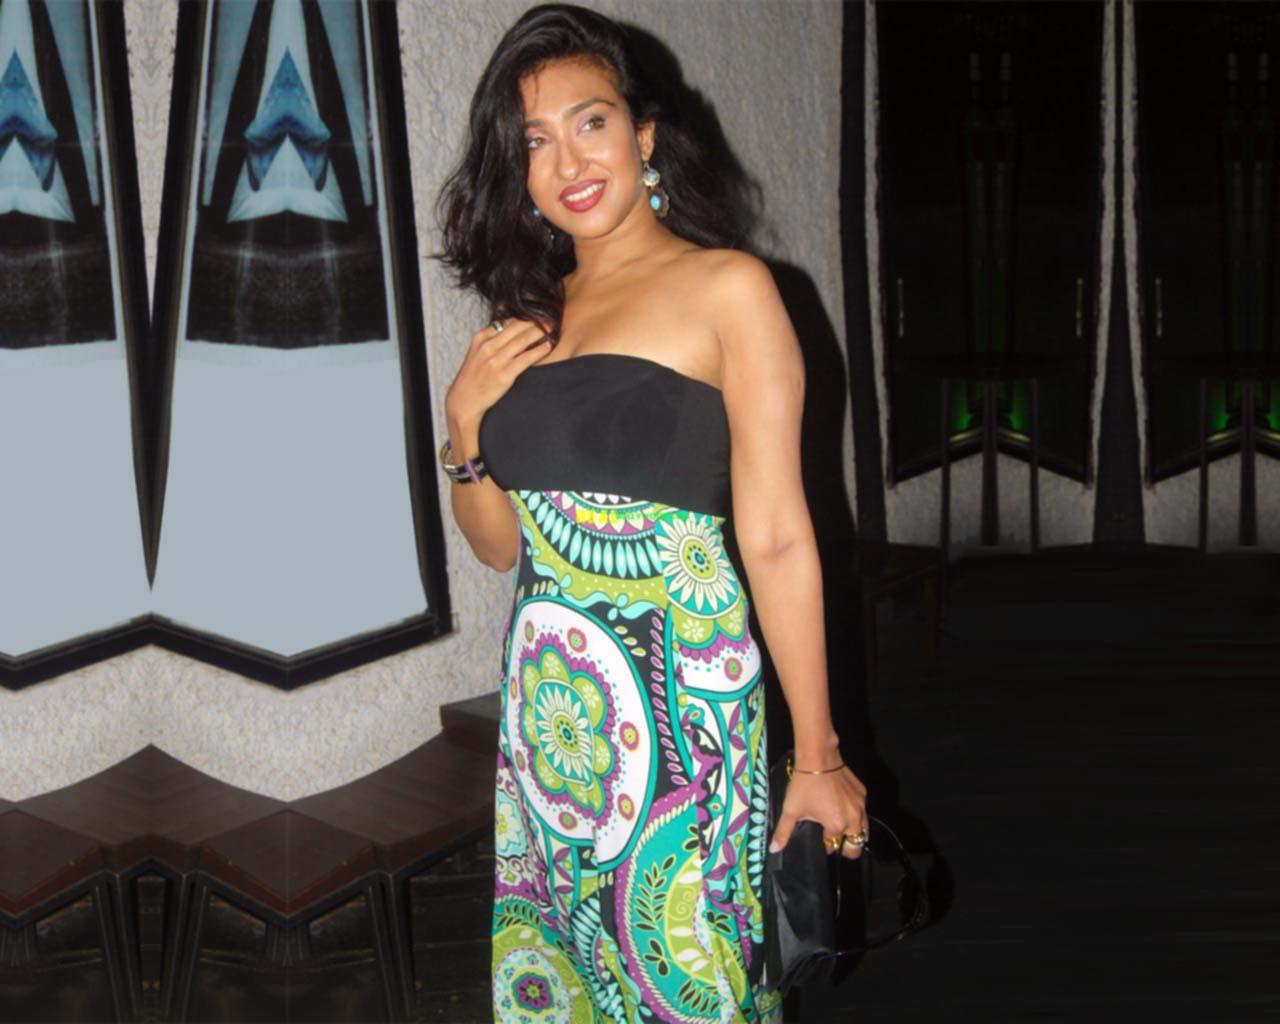 bollywood fan: Minissha Lamba Hot Wallpapers: Hot Bikini